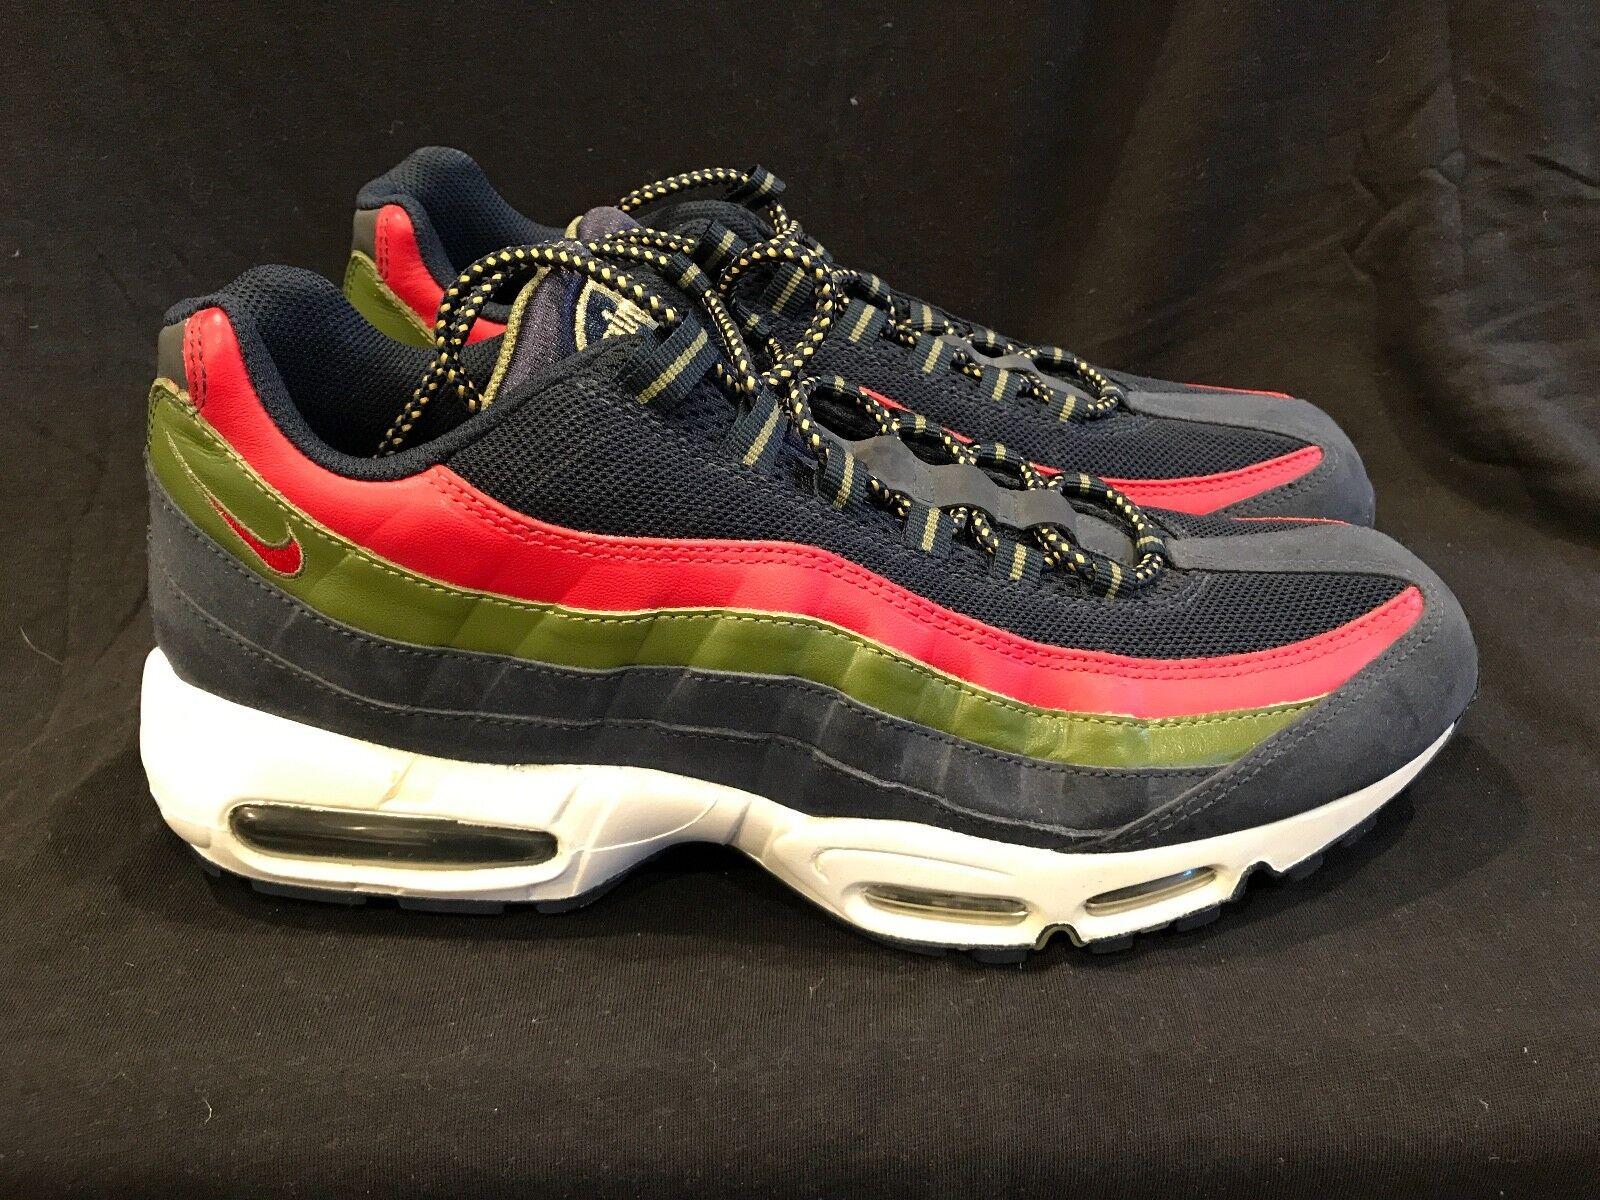 BRAND NEW Nike Air Max 95 Obsidian / Red / Green Sz 12 airmax 97 limited